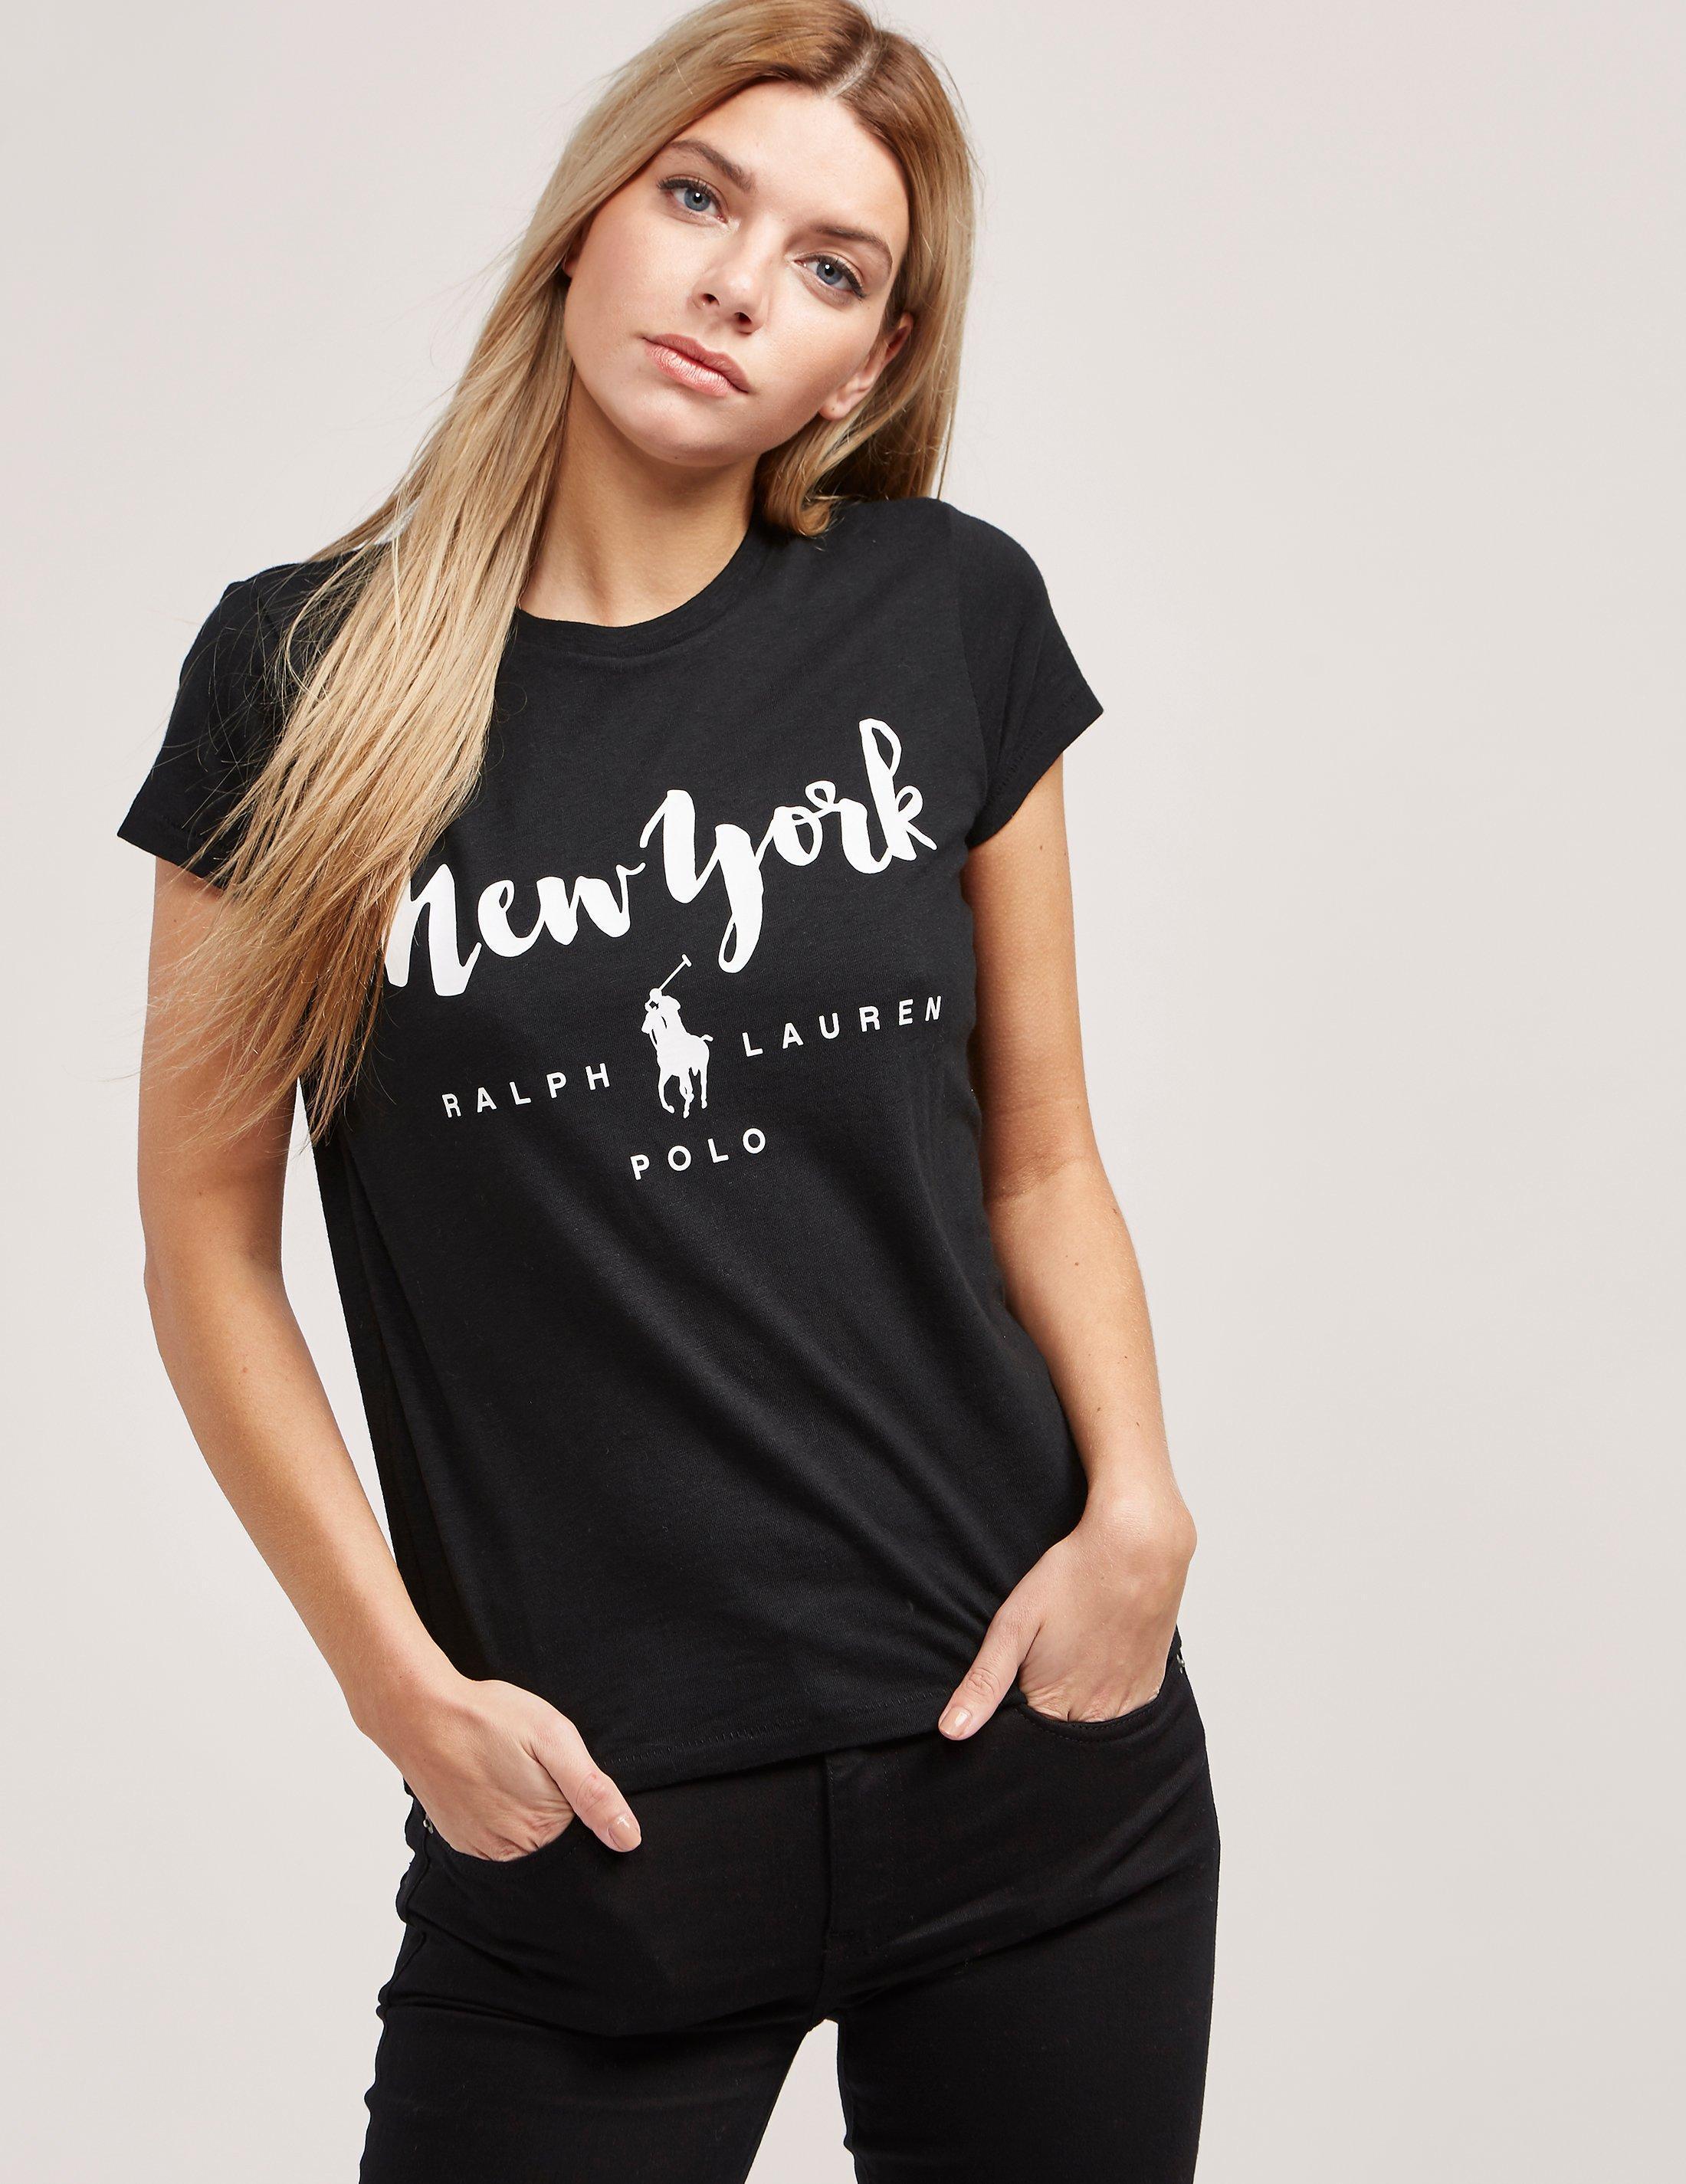 fb8715901ea82 Lyst - Polo Ralph Lauren Womens New York Short Sleeve T-shirt Black ...